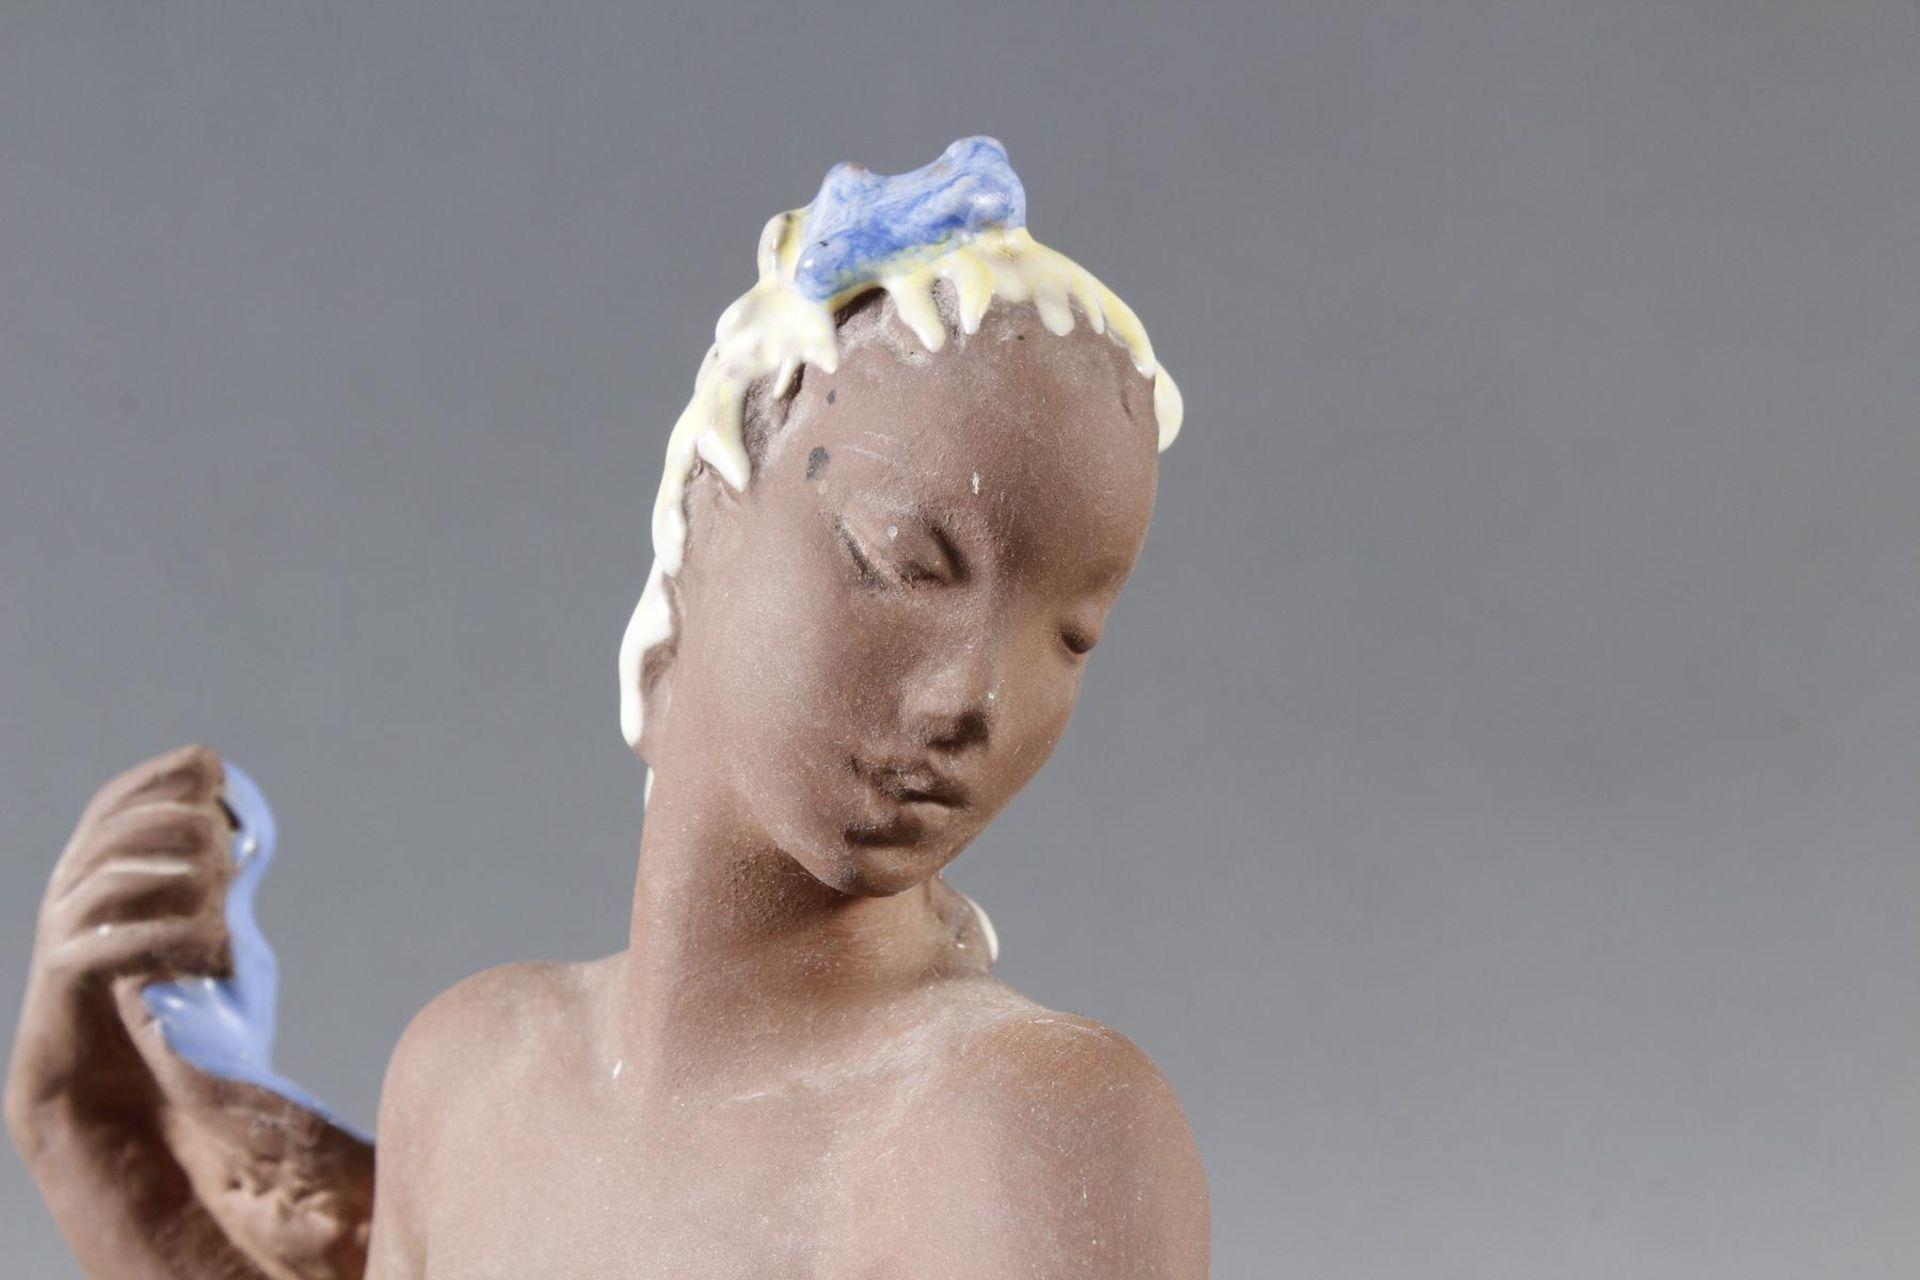 Karlsruher Majolika, Tänzerin, Nr. 6131, Lore Friedrich, Gronau 1956-62 - Bild 4 aus 7